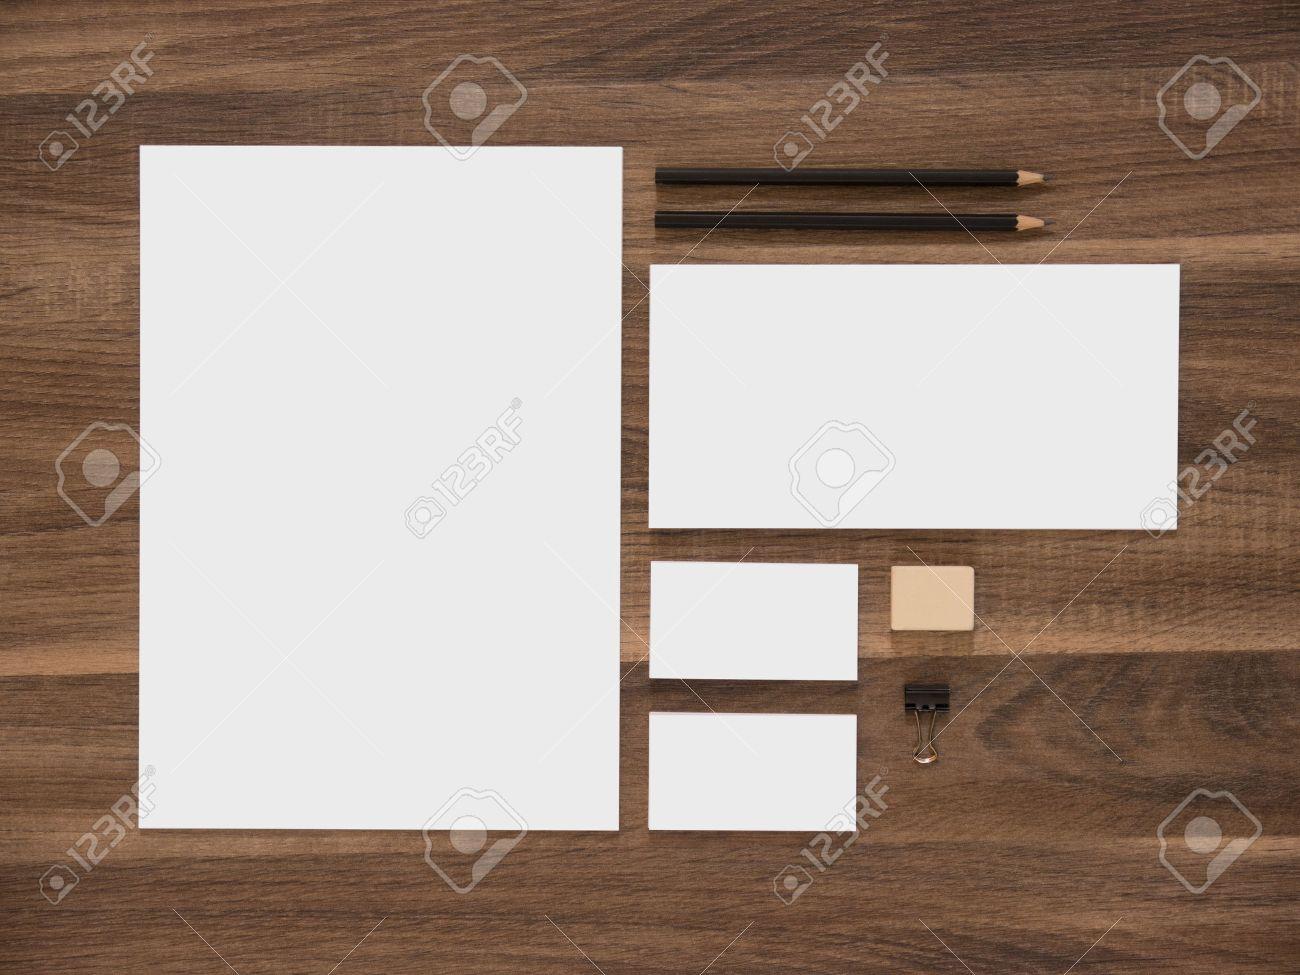 Branding mockup letterhead envelope and blank business cards letterhead envelope and blank business cards simple corporate design presentation template reheart Gallery